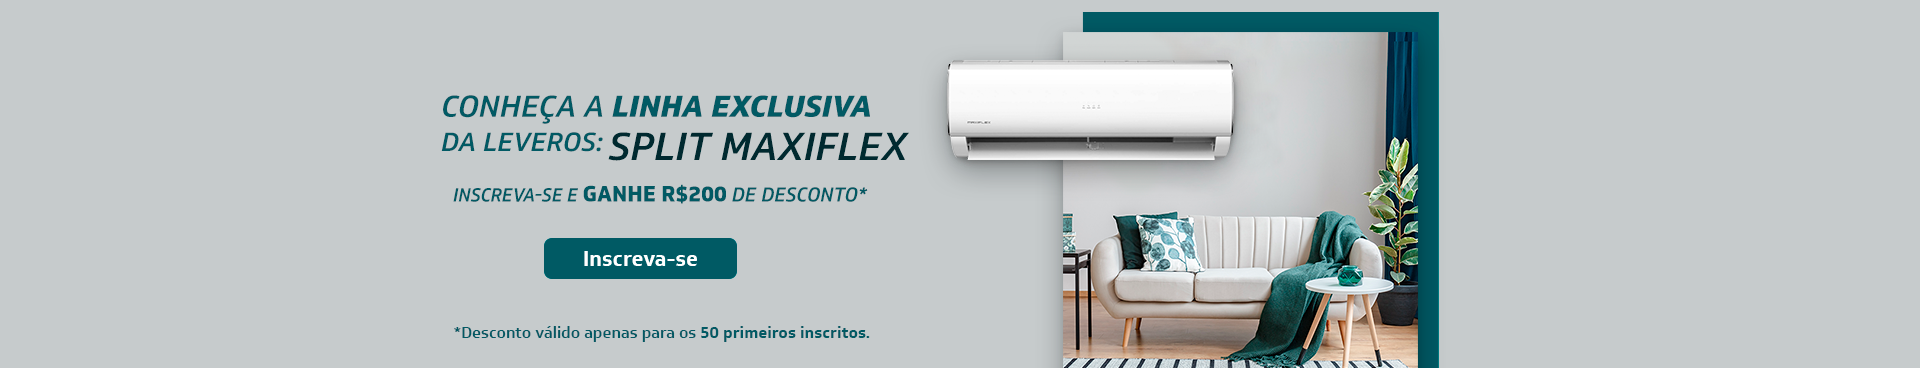 fb-desk-maxiflex